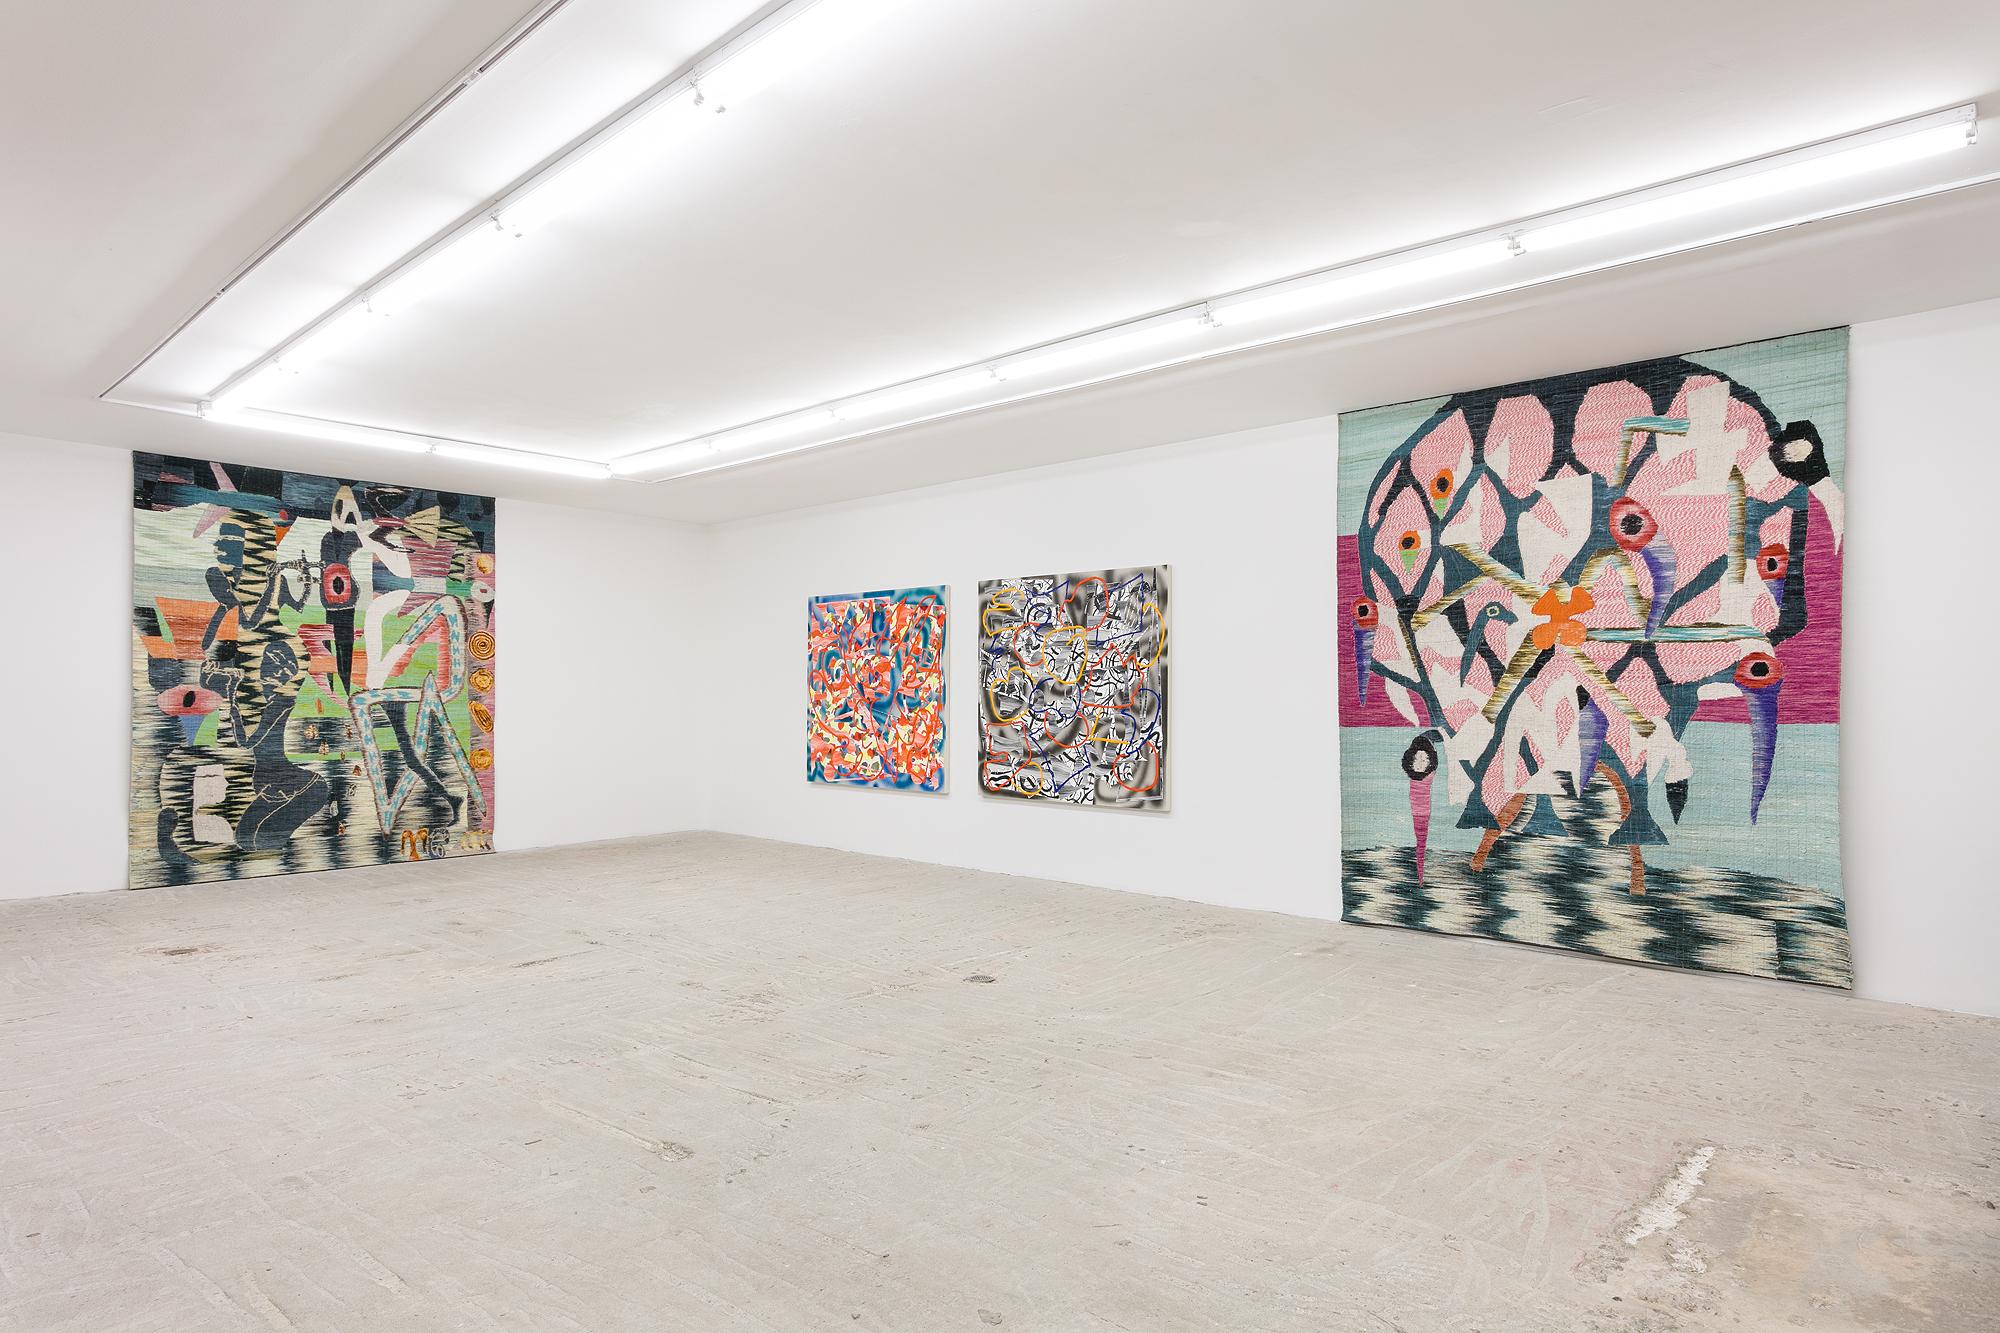 Trudy Benson and Yann Gerstberger    TT52   June 8 - July 28, 2017  Installation View